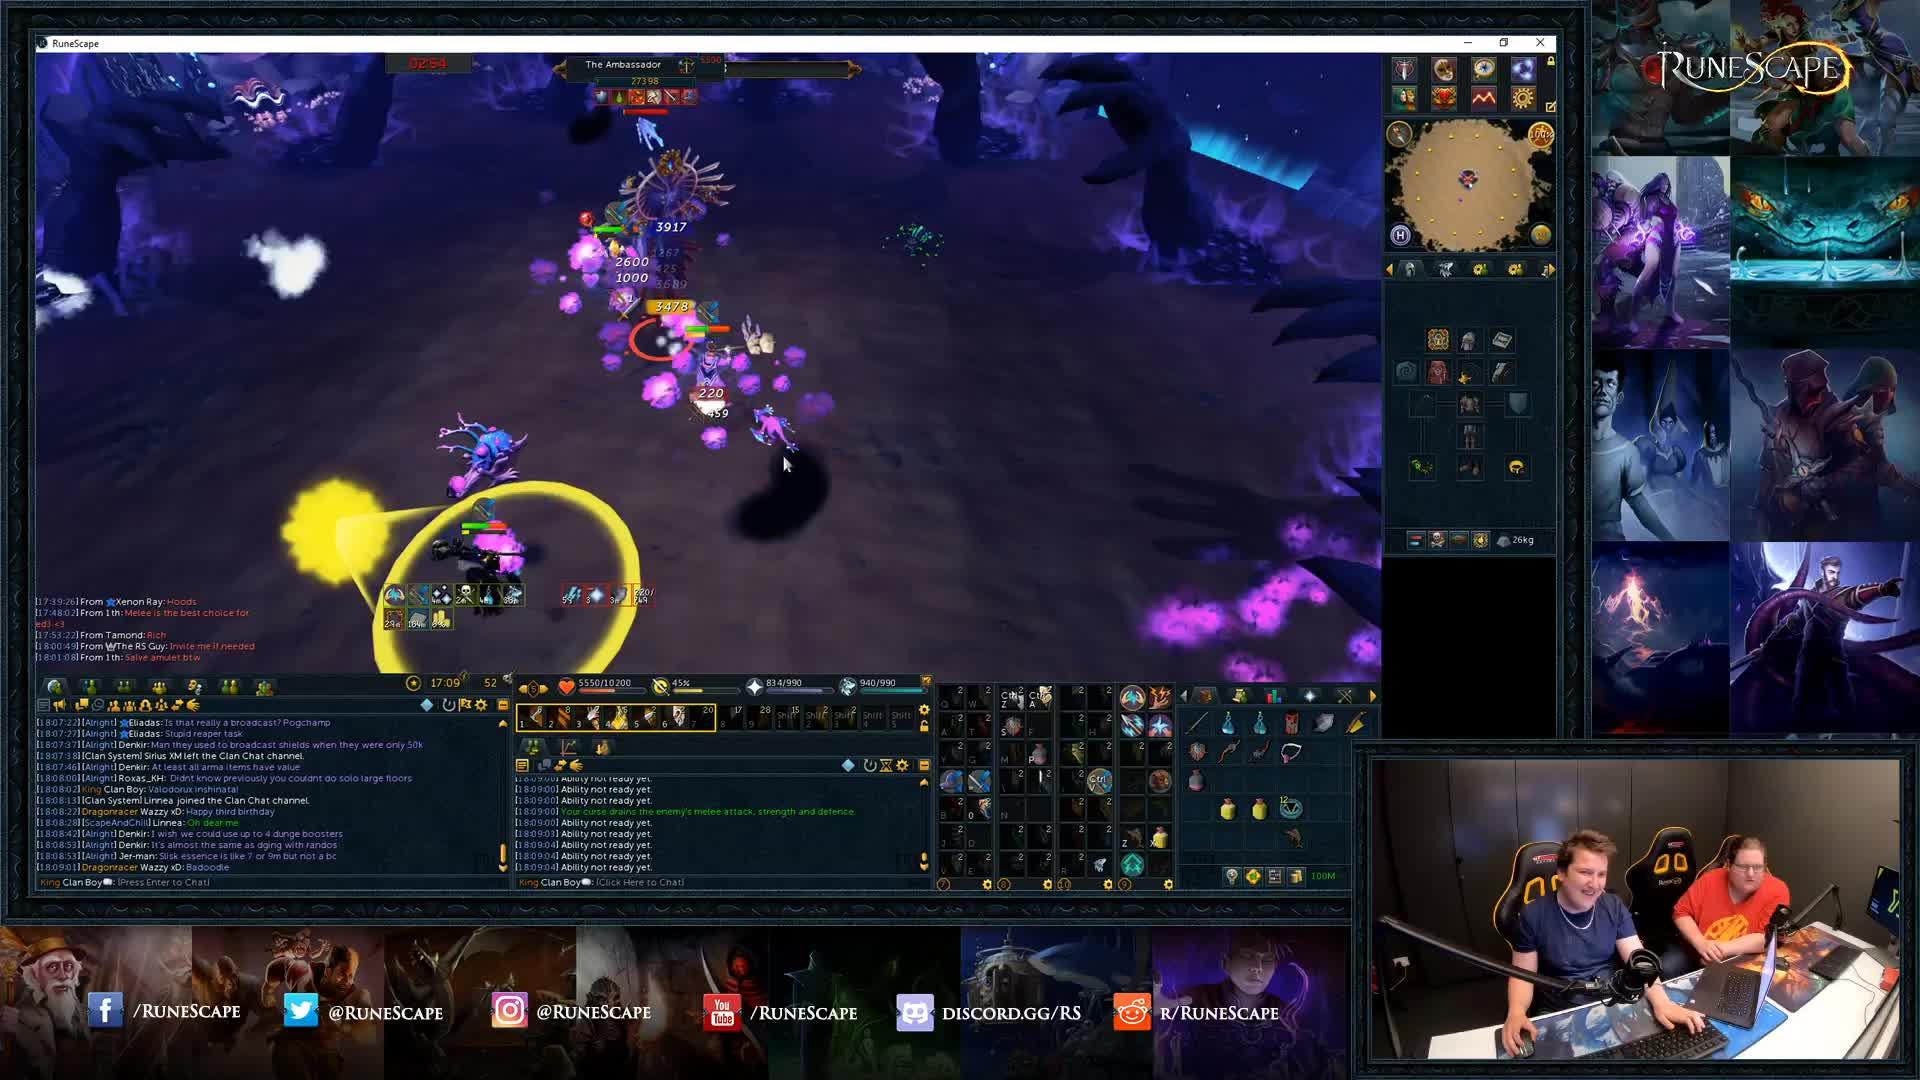 RuneScape - bxvbcvb - Twitch